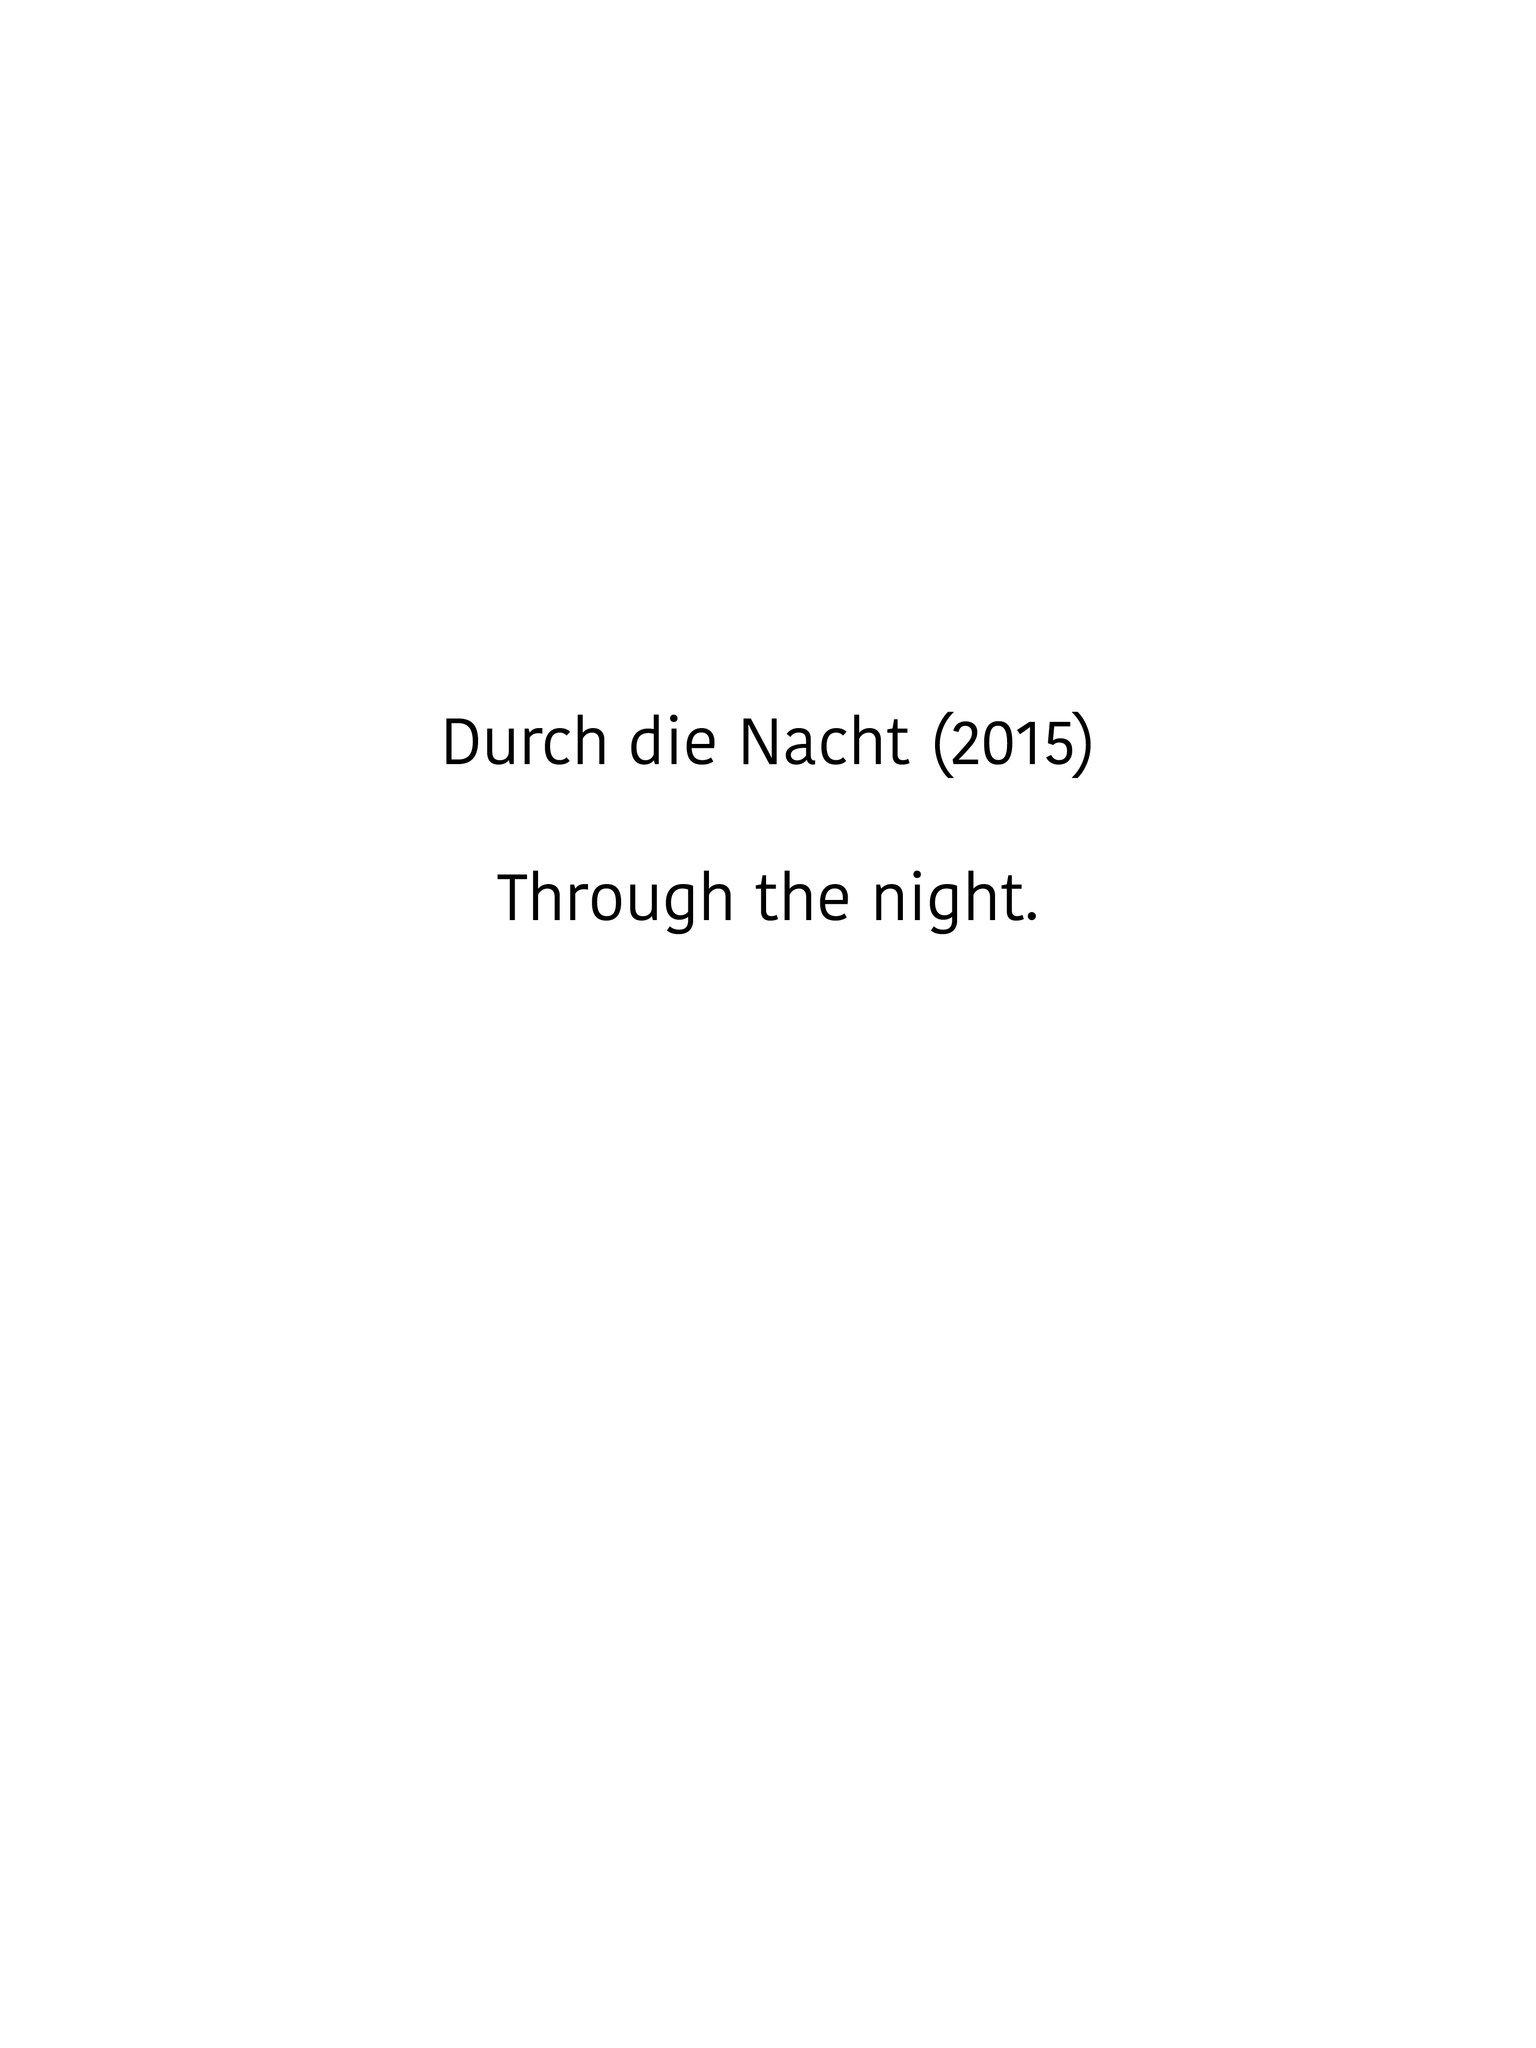 Text DDN neu.jpg